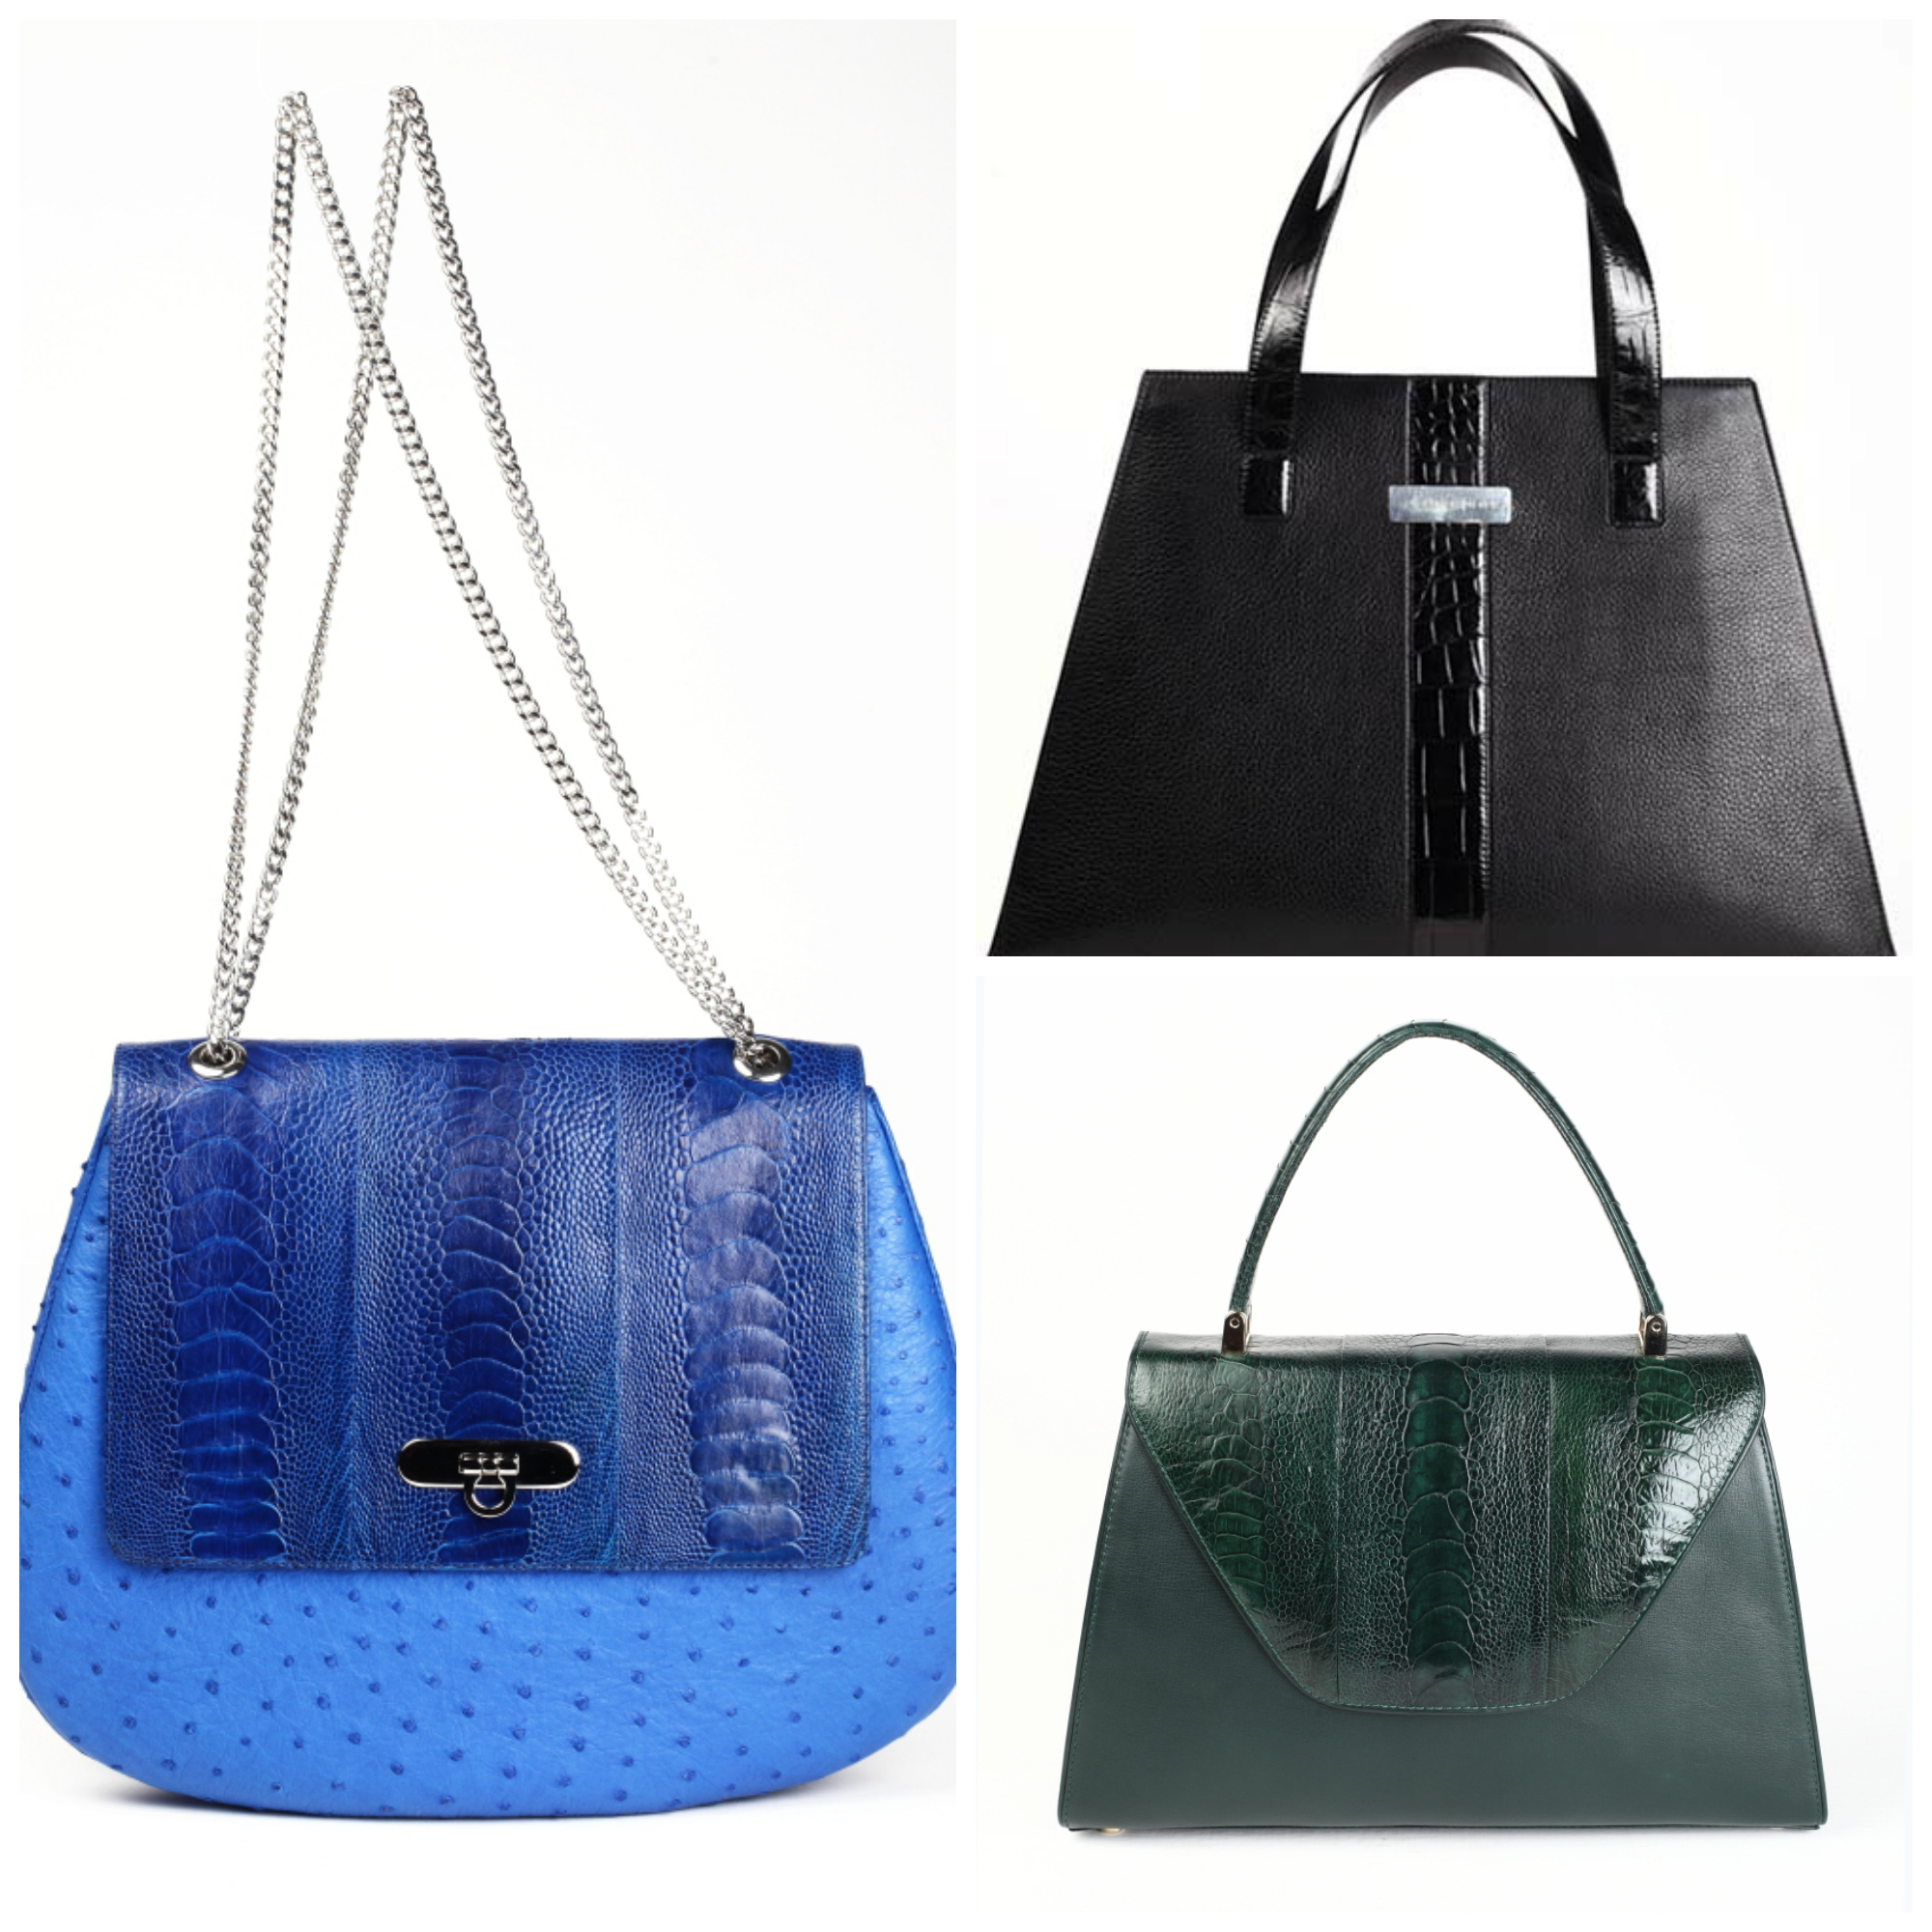 Les Sacs Adama Paris / Bags By Adama Paris